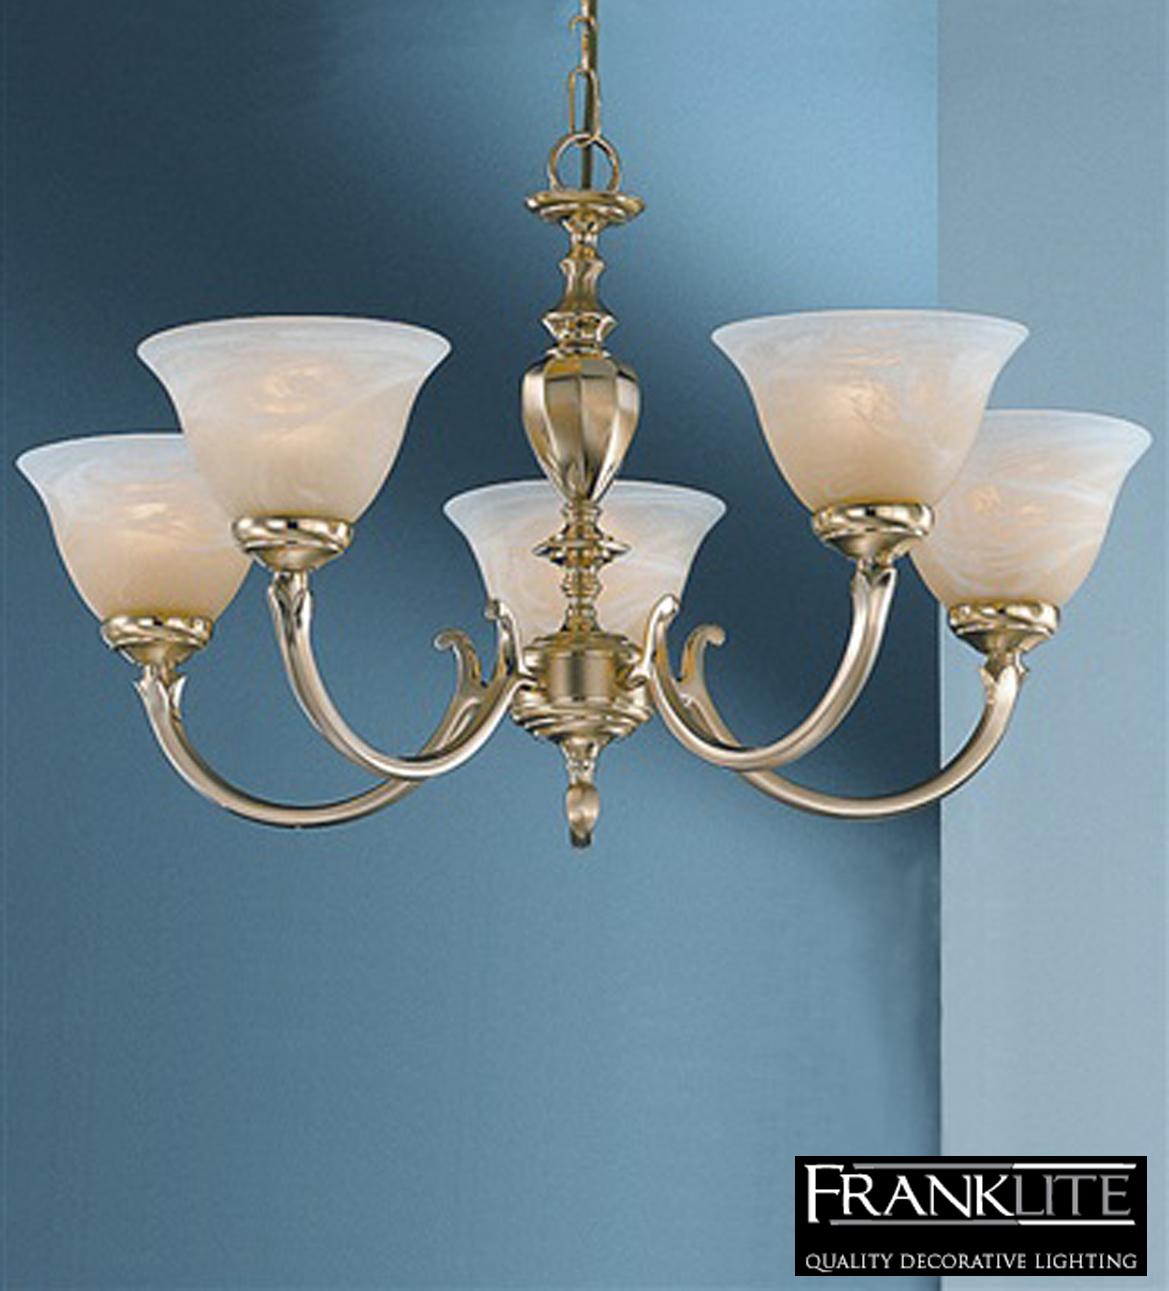 Brass Finish Ceiling Lights : Franklite miami satin polished brass finish light